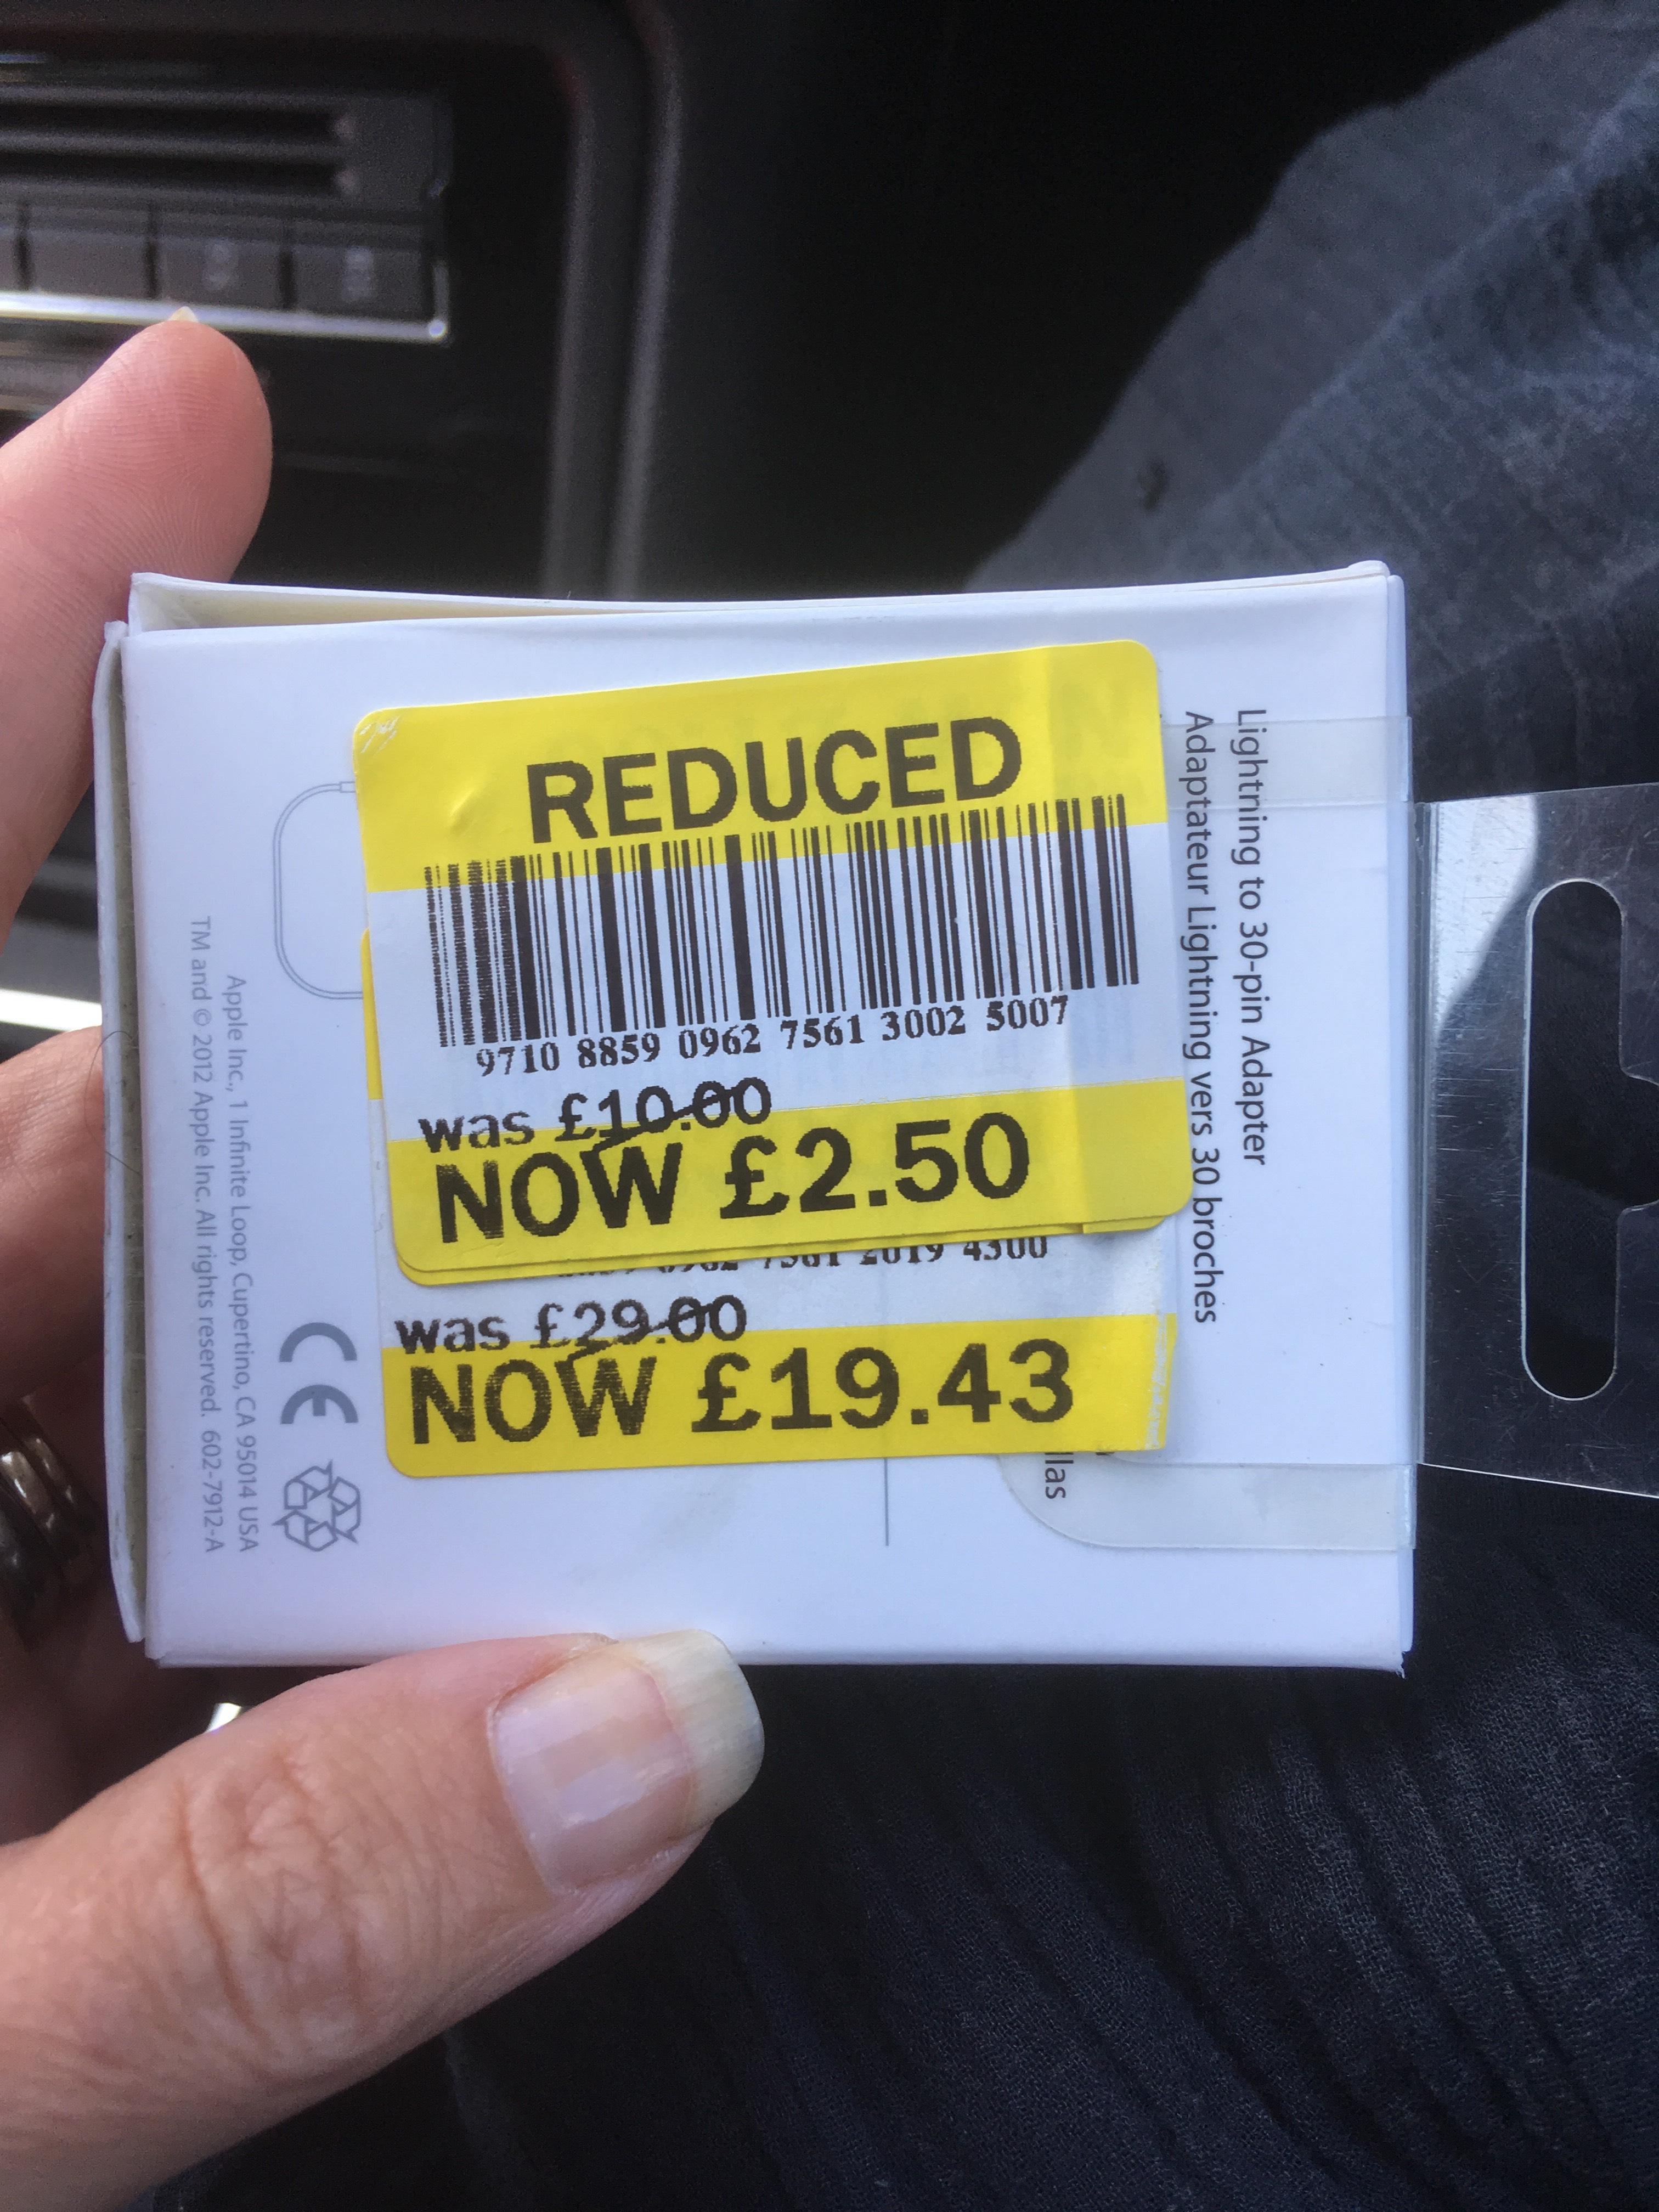 Genuine apple lightening to 30 pin adapter £2.50 Tesco instore (Portland)